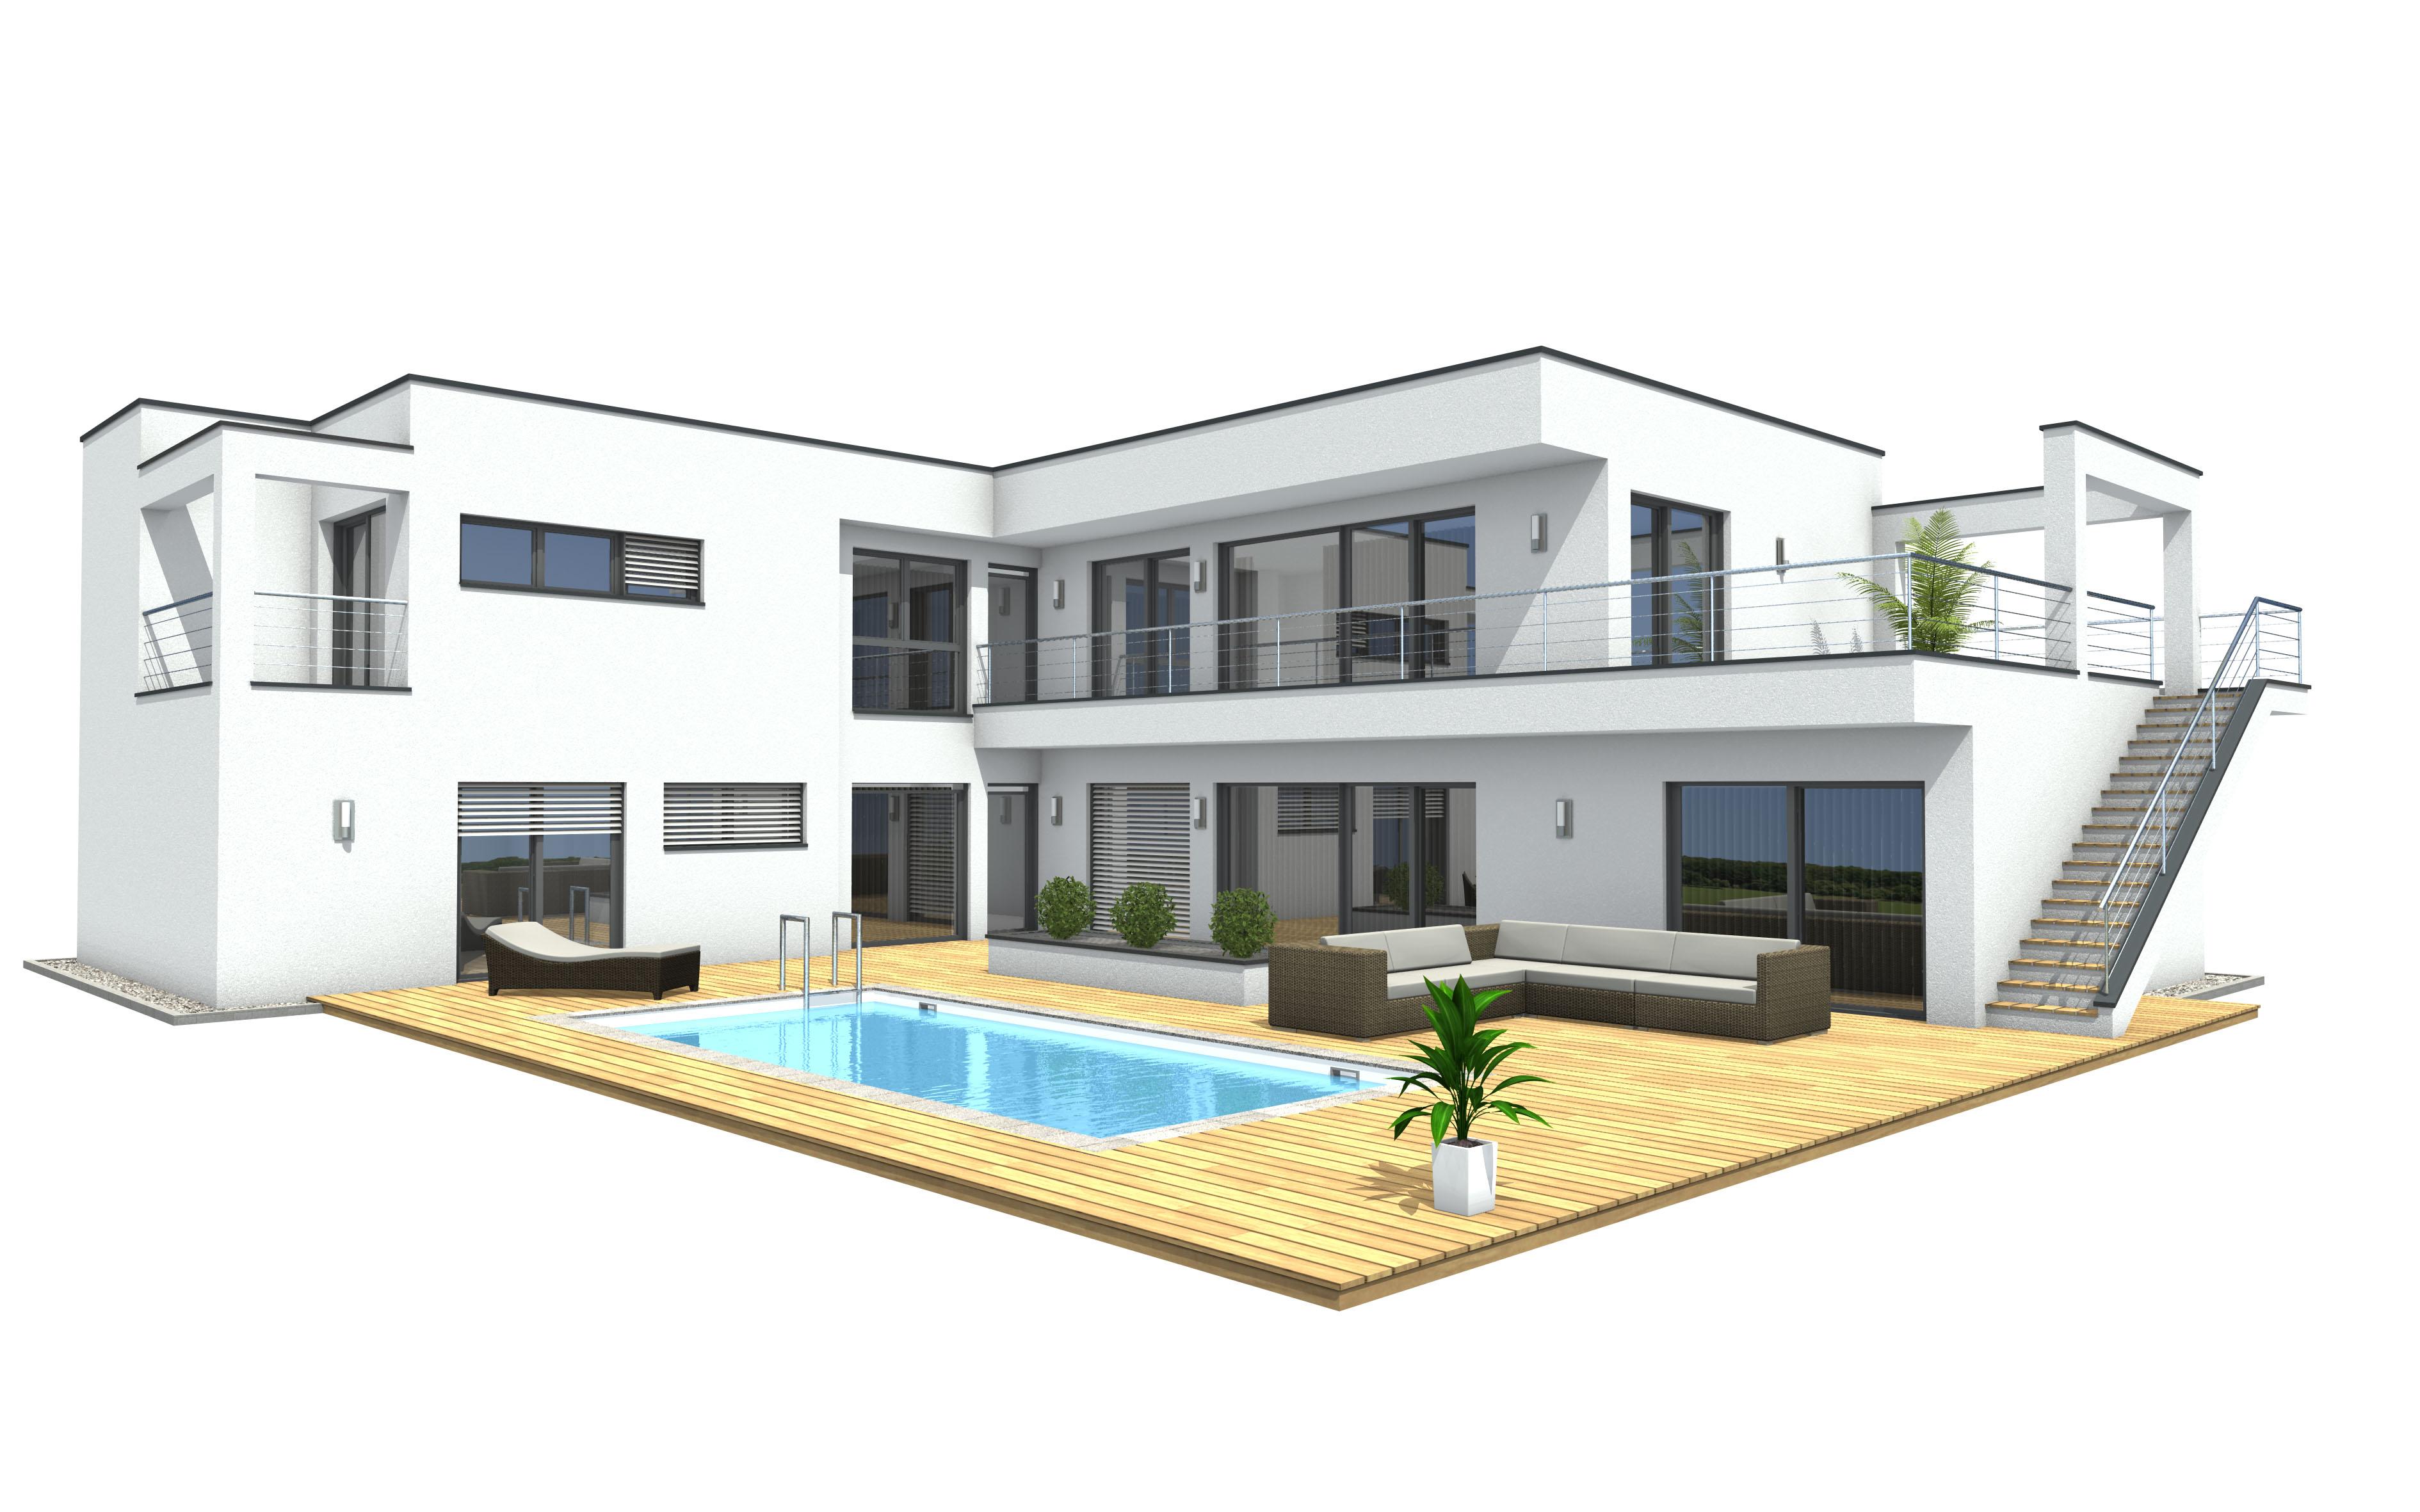 etzi haus austrohaus neubauprojekte. Black Bedroom Furniture Sets. Home Design Ideas